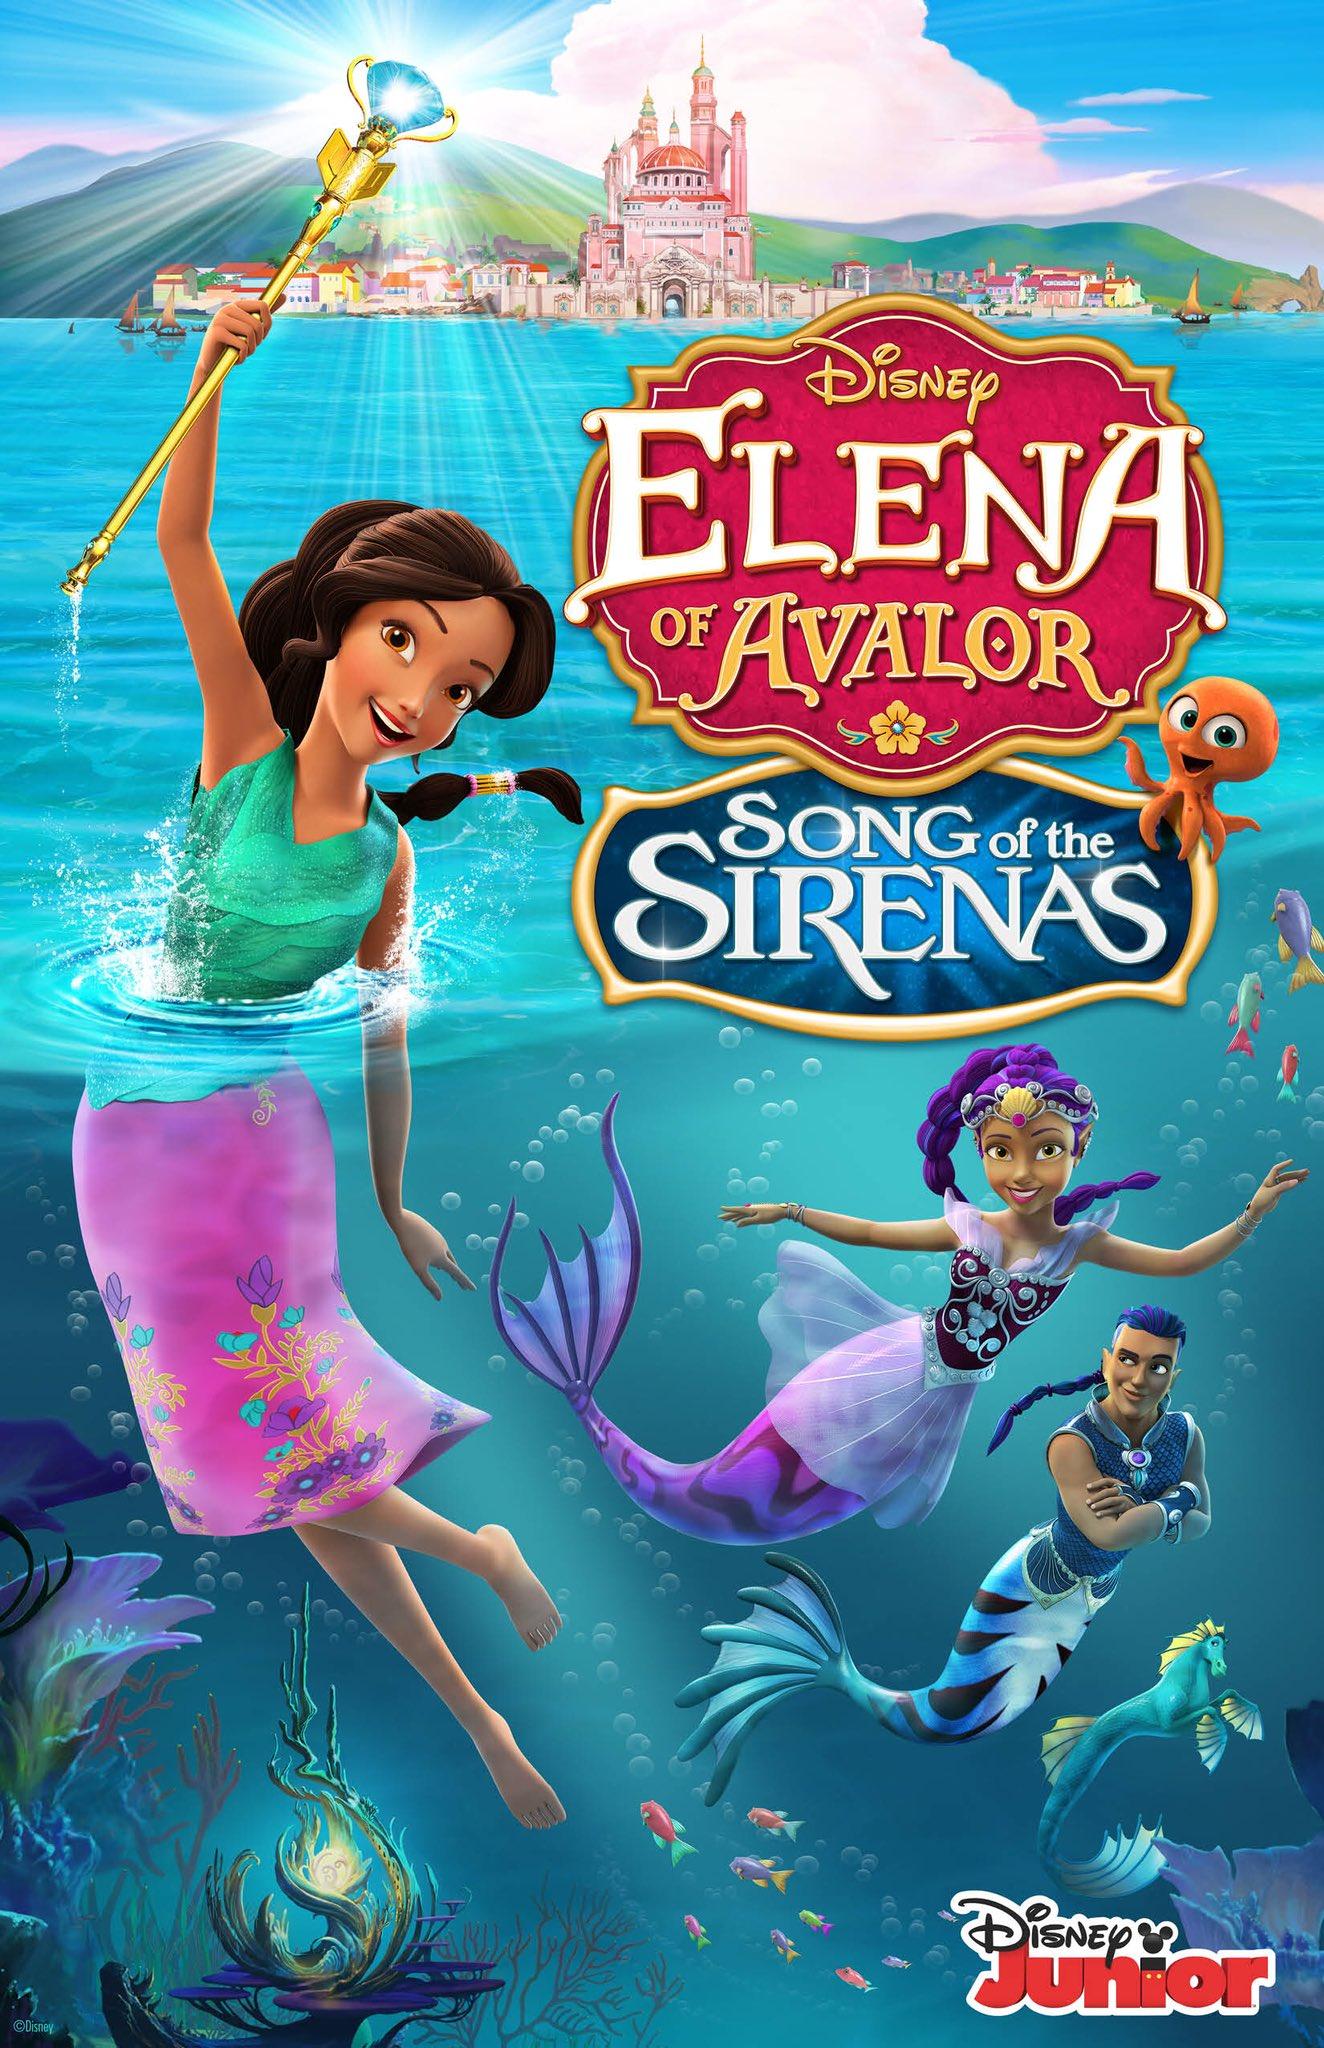 Dnob9BlW4AAjnH2.jpg_large.jpegElena of Avalor - Song of the Sirenas.jpg